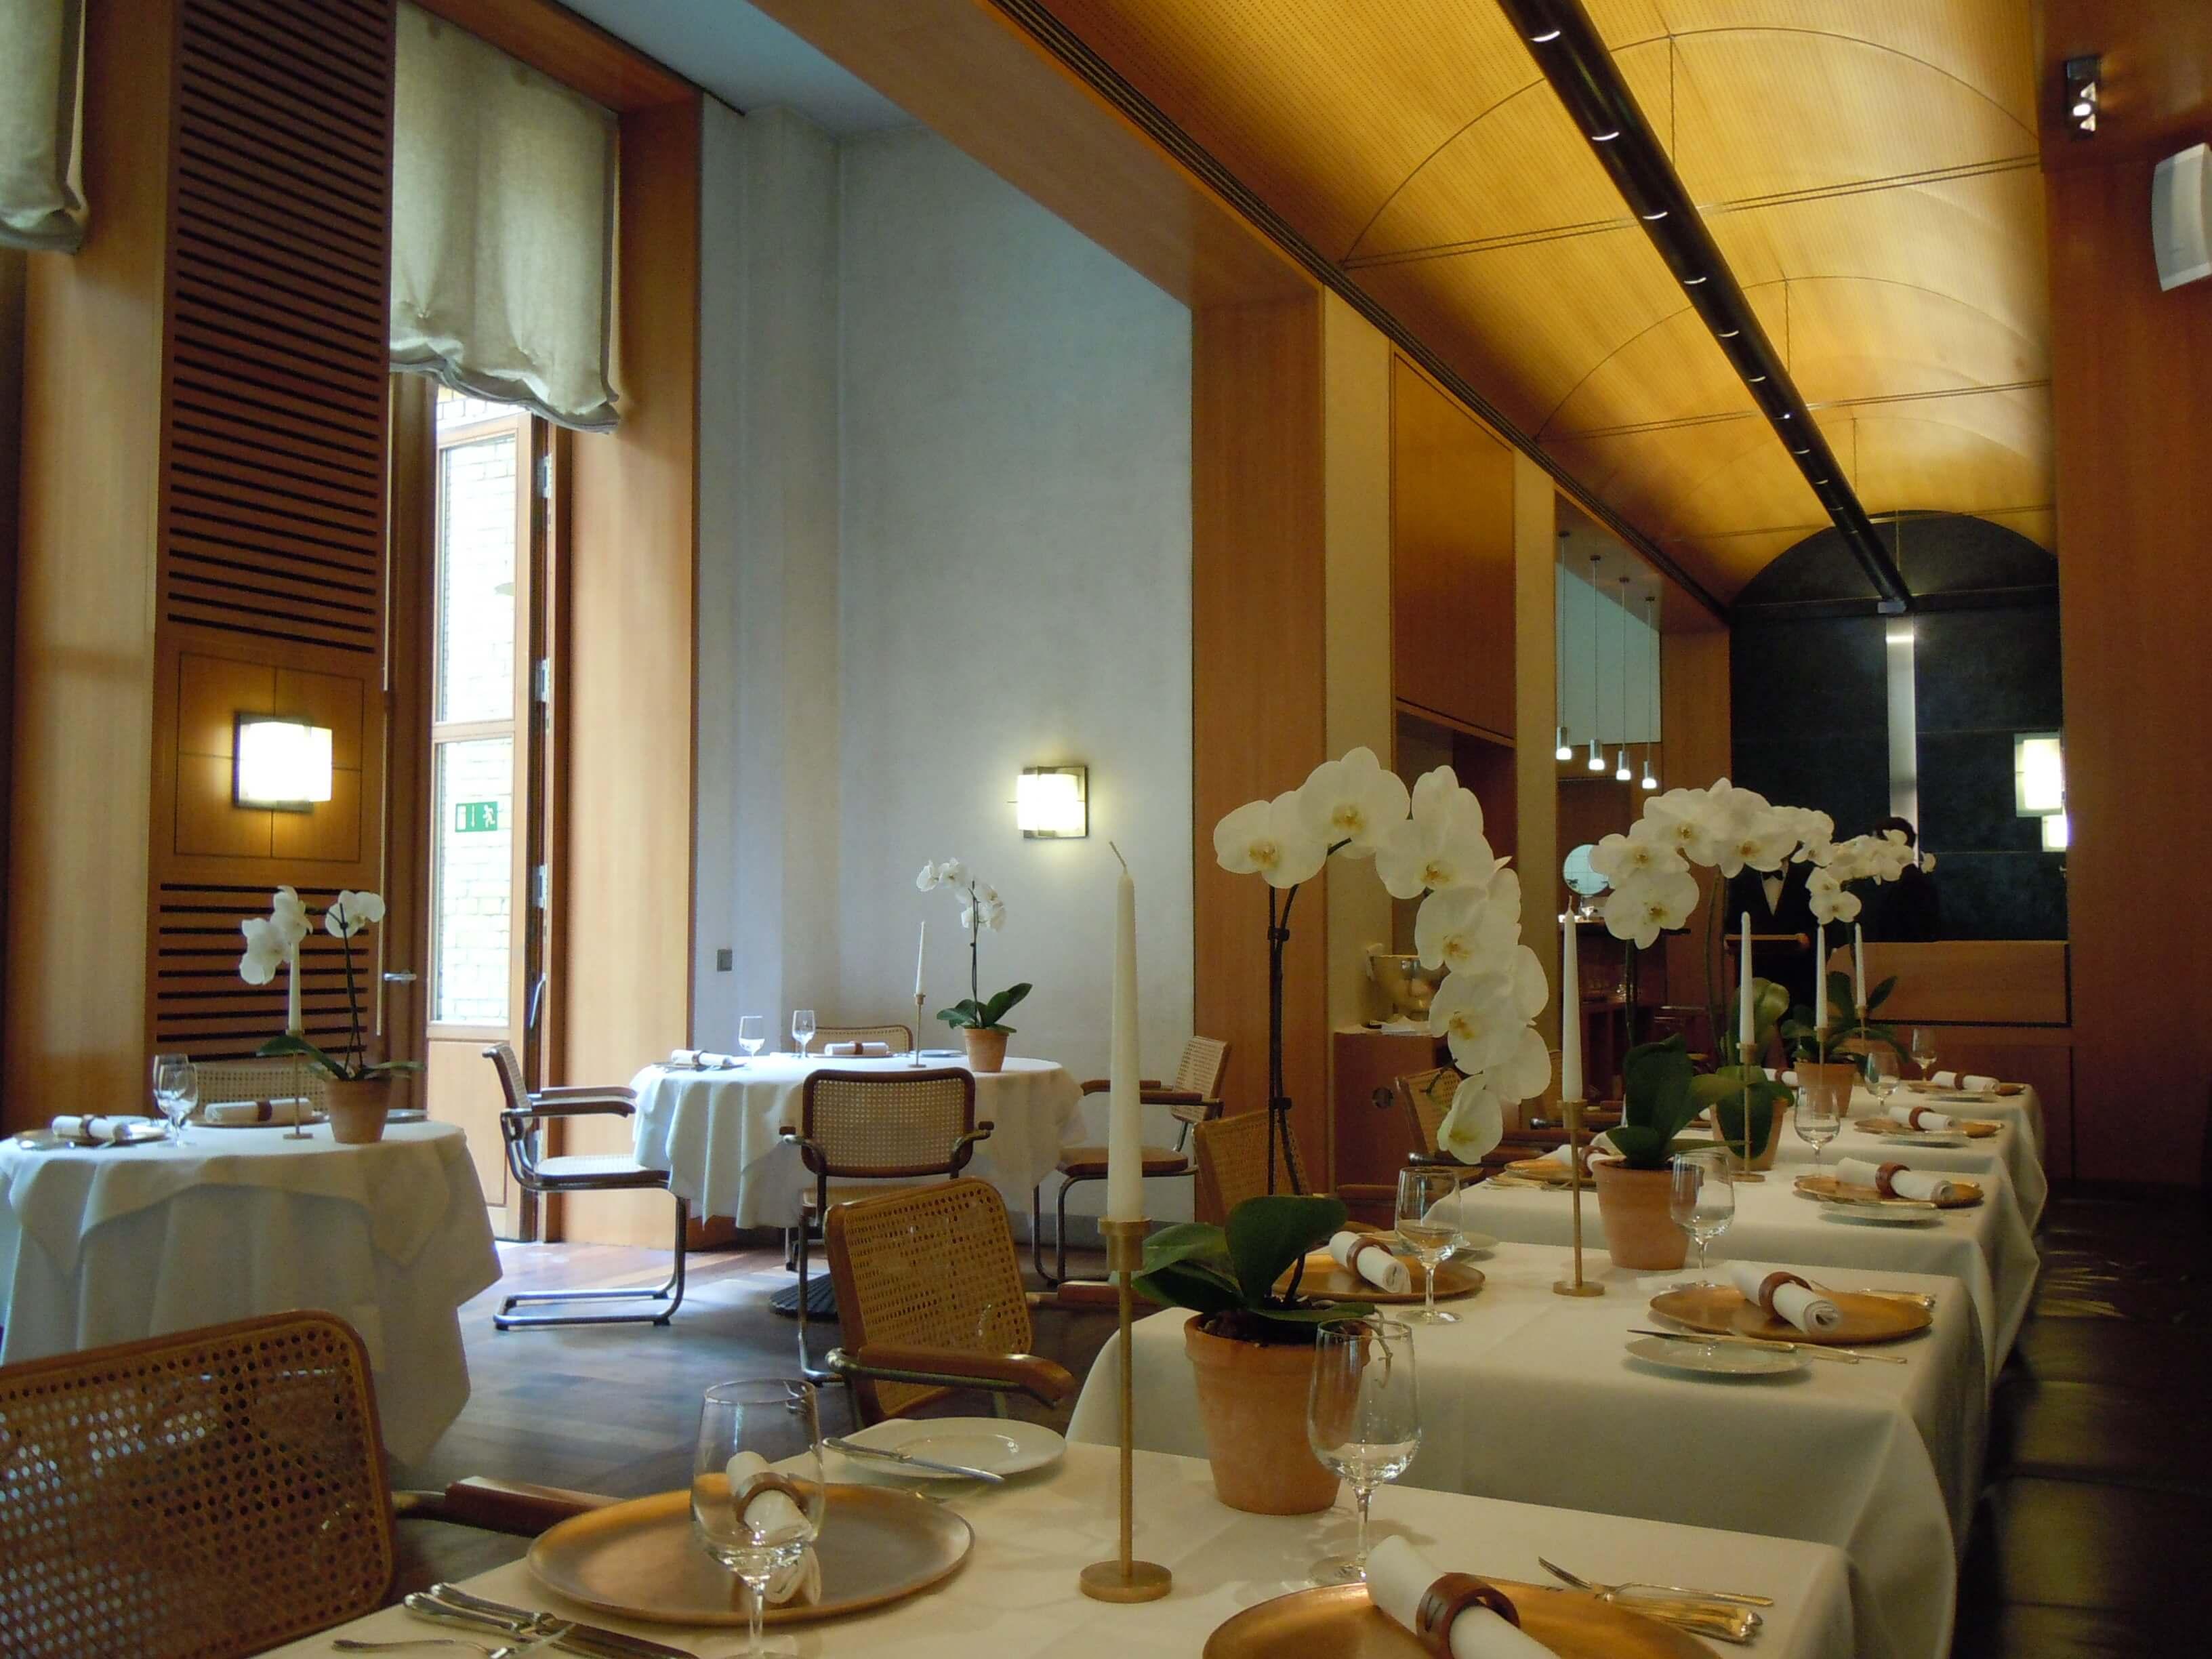 The Vau Restaurant In Berlin